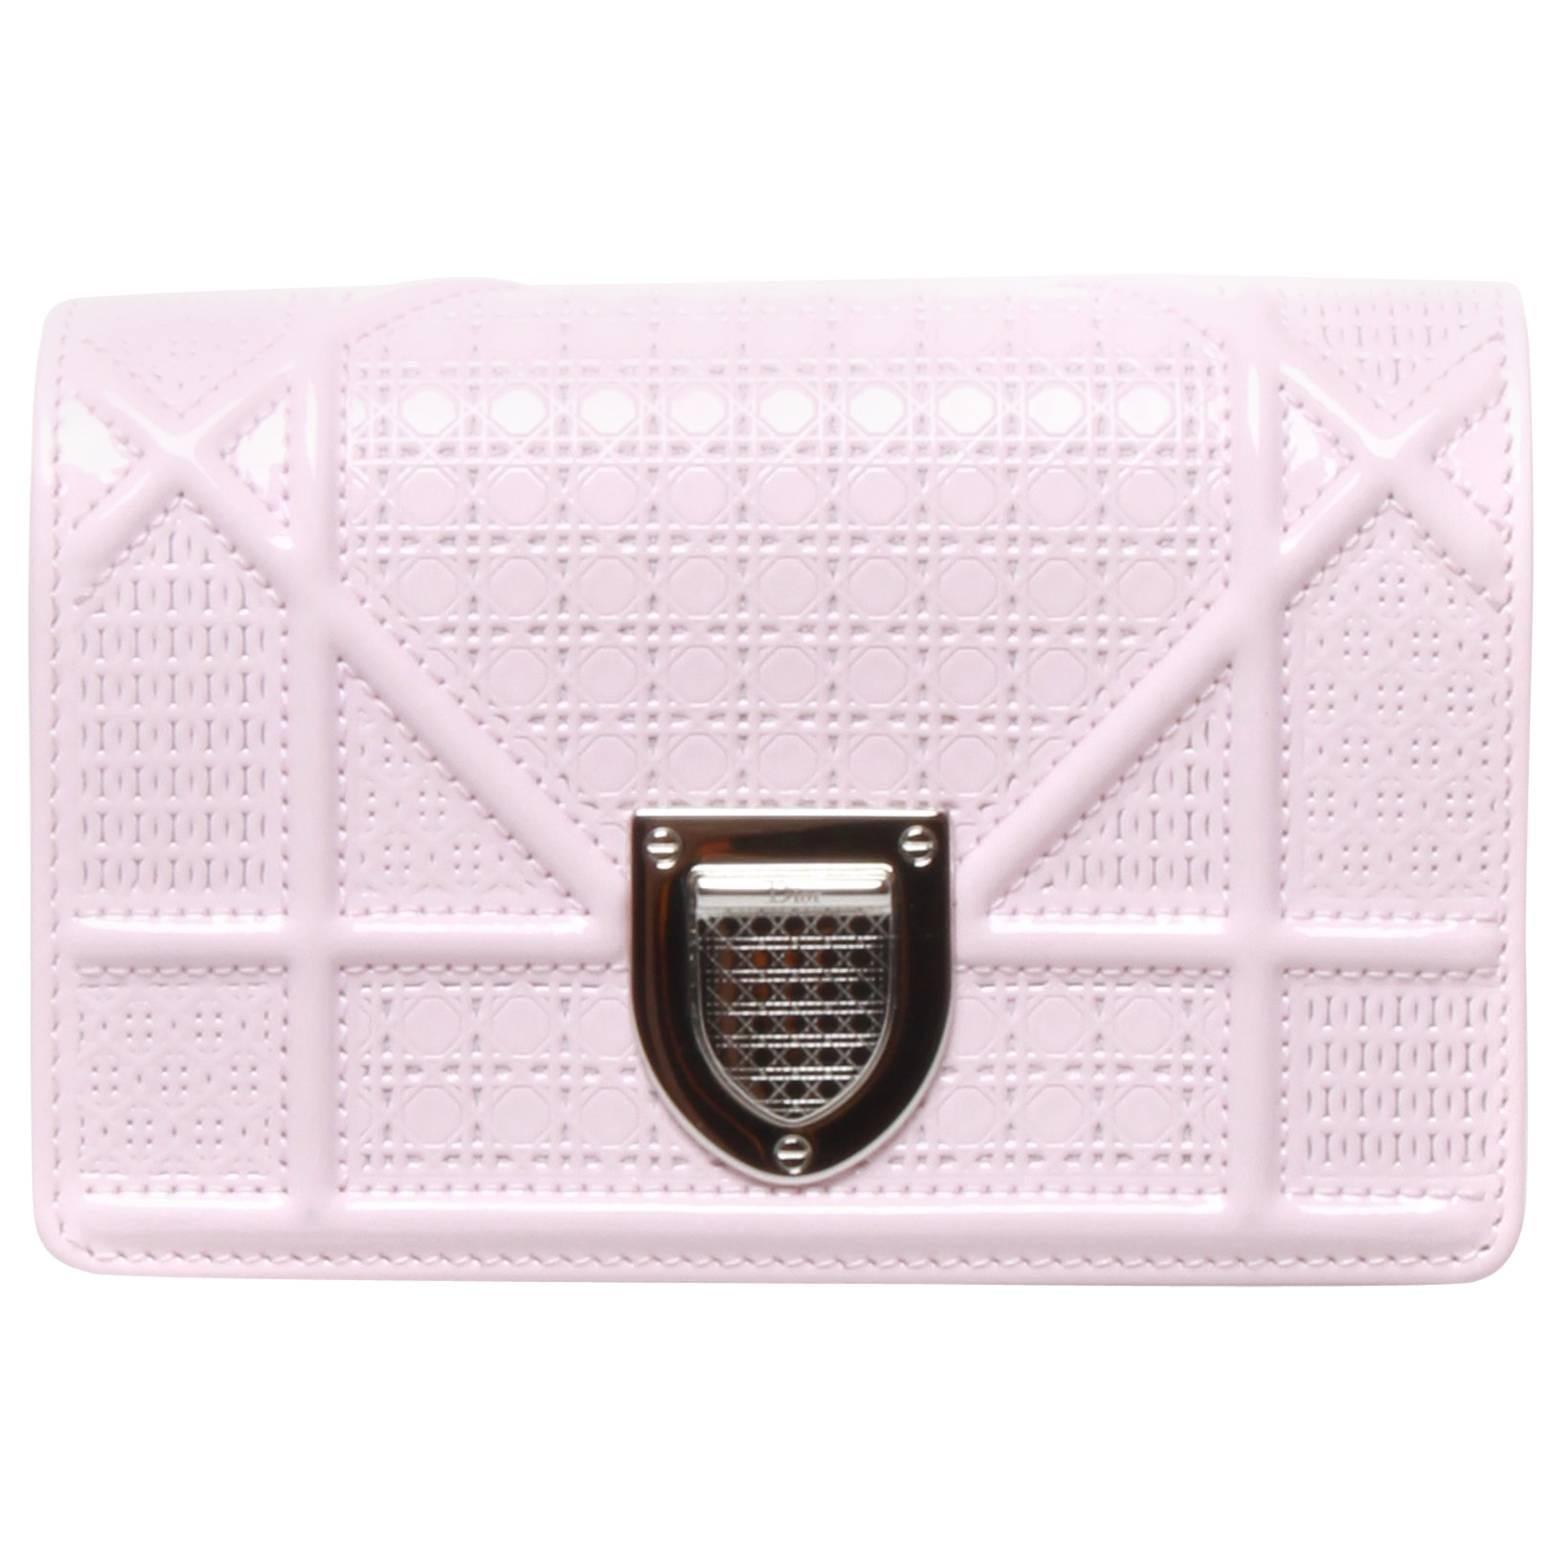 Christian Dior Baby Pink Mini Diorama Bag at 1stdibs 03668d69c20a